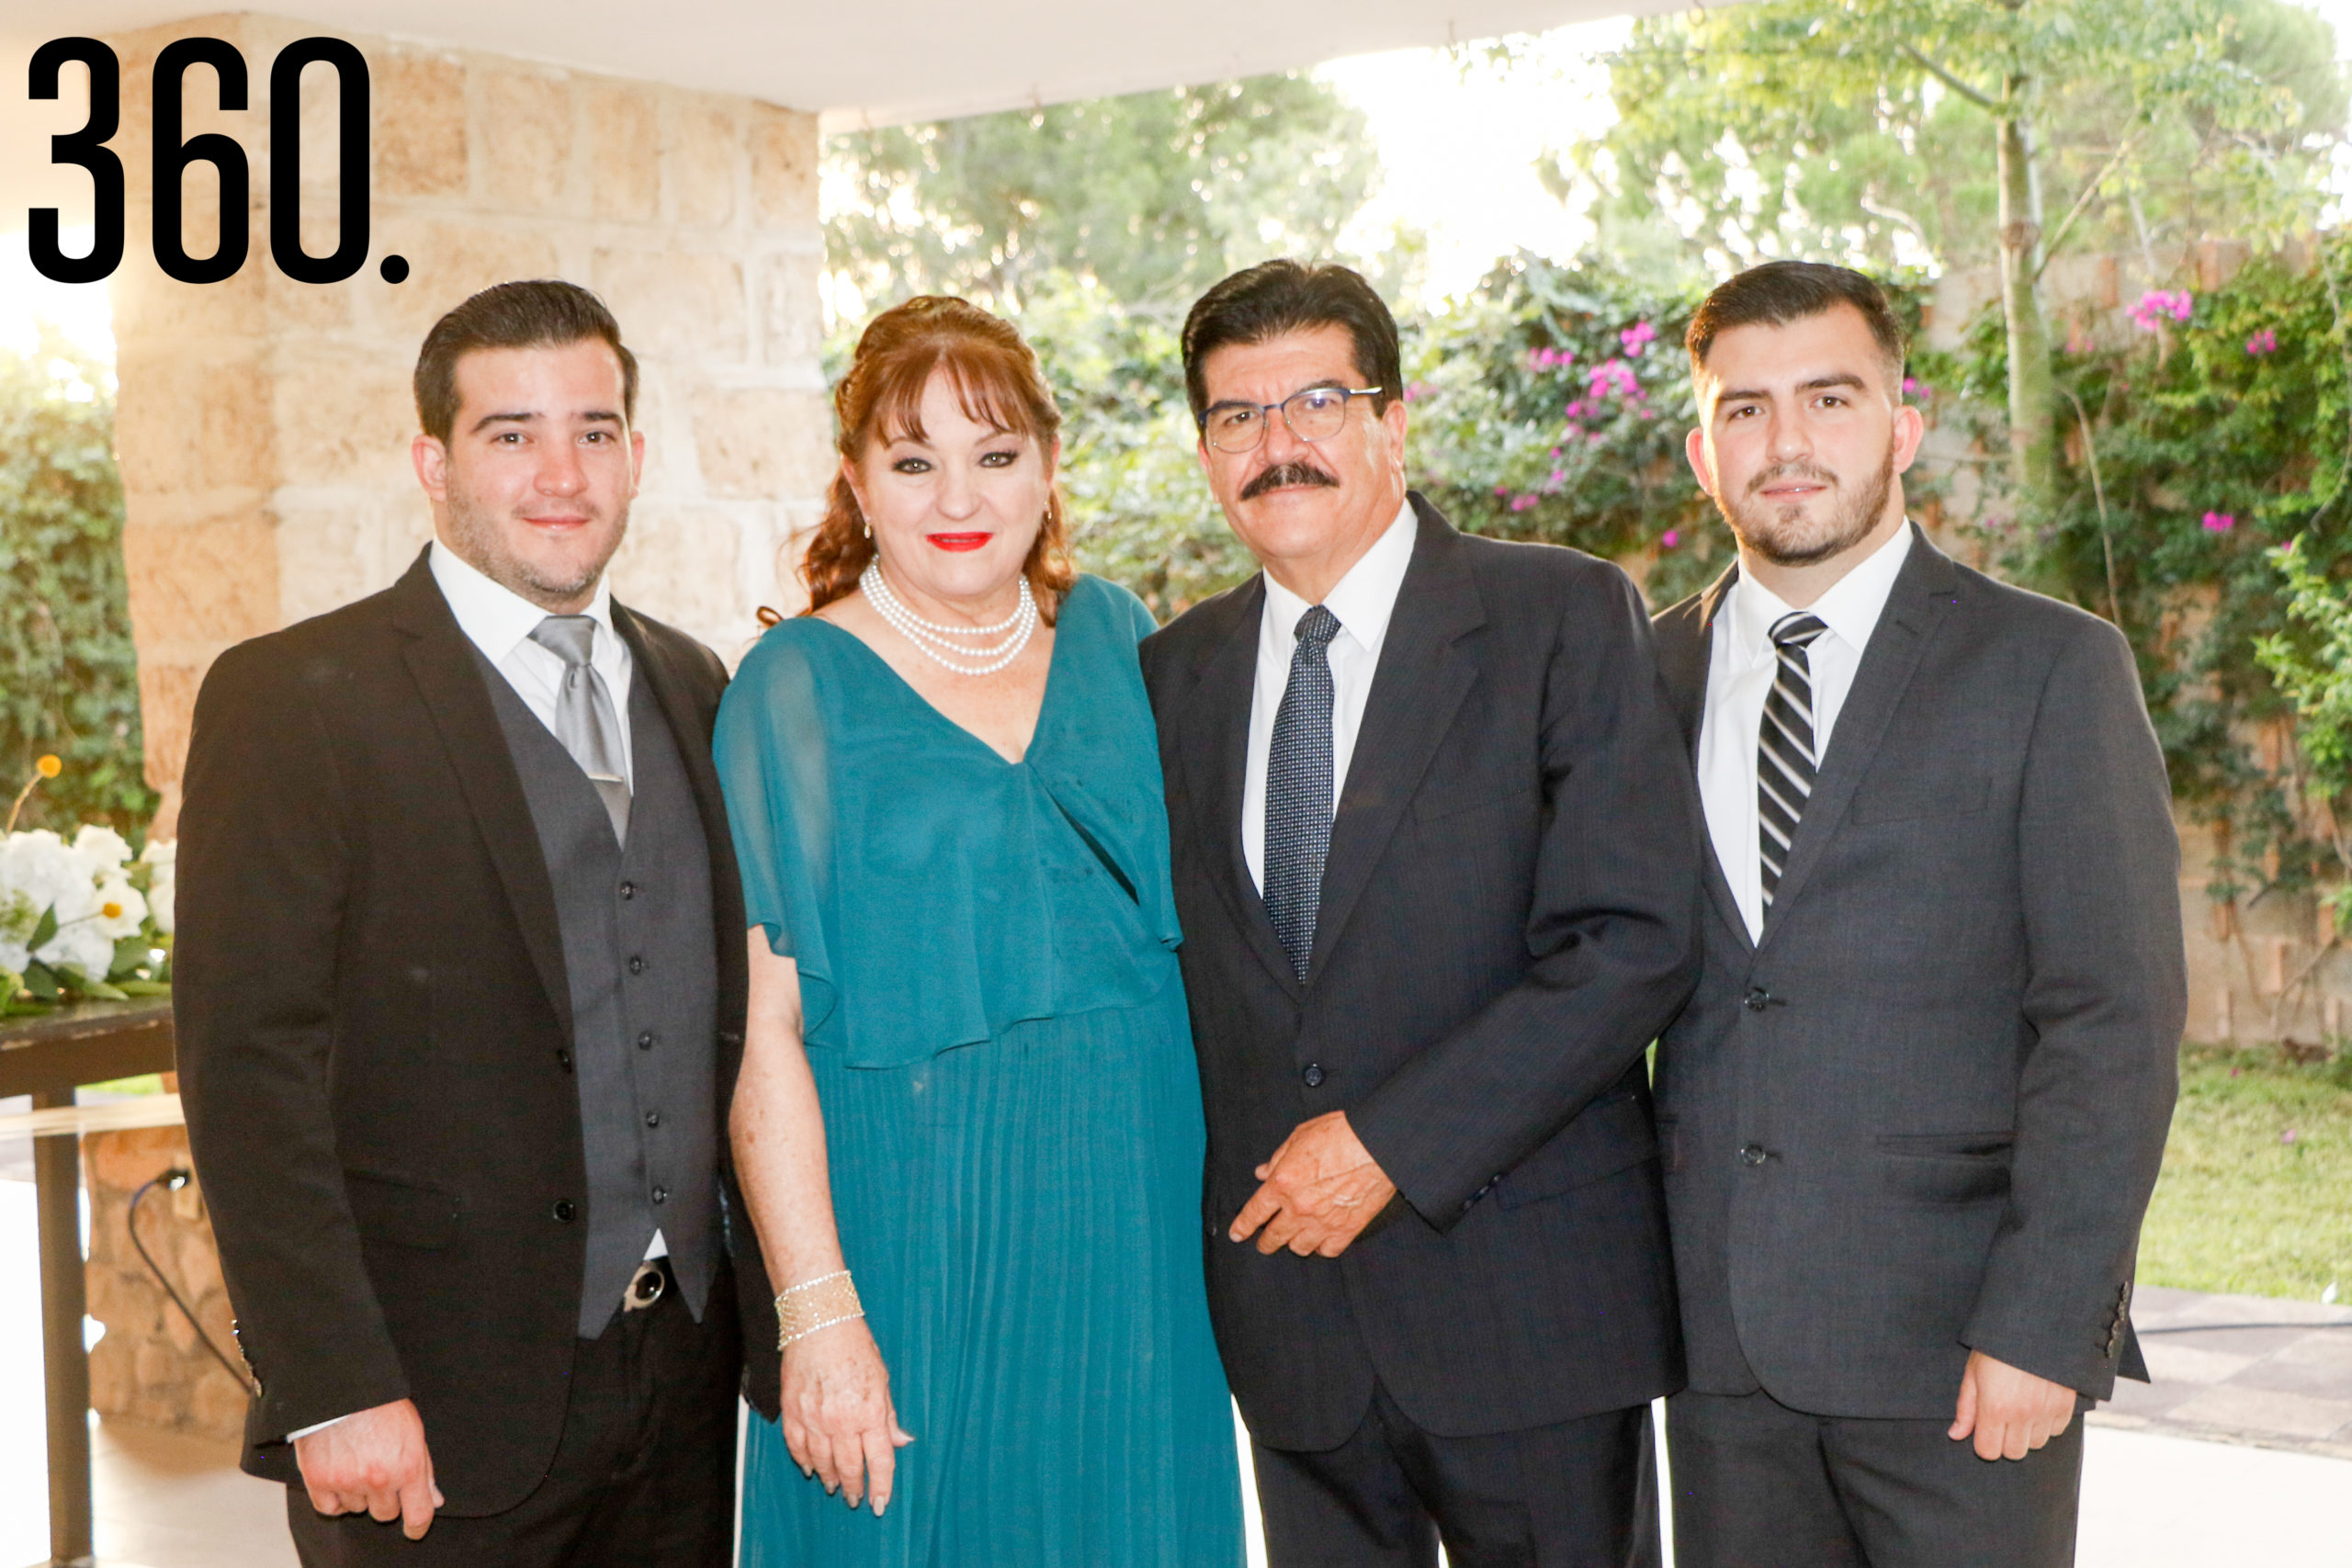 Gaspar Reyes, Sandra Peart, Gaspar Reyes y Rafael Reyes.